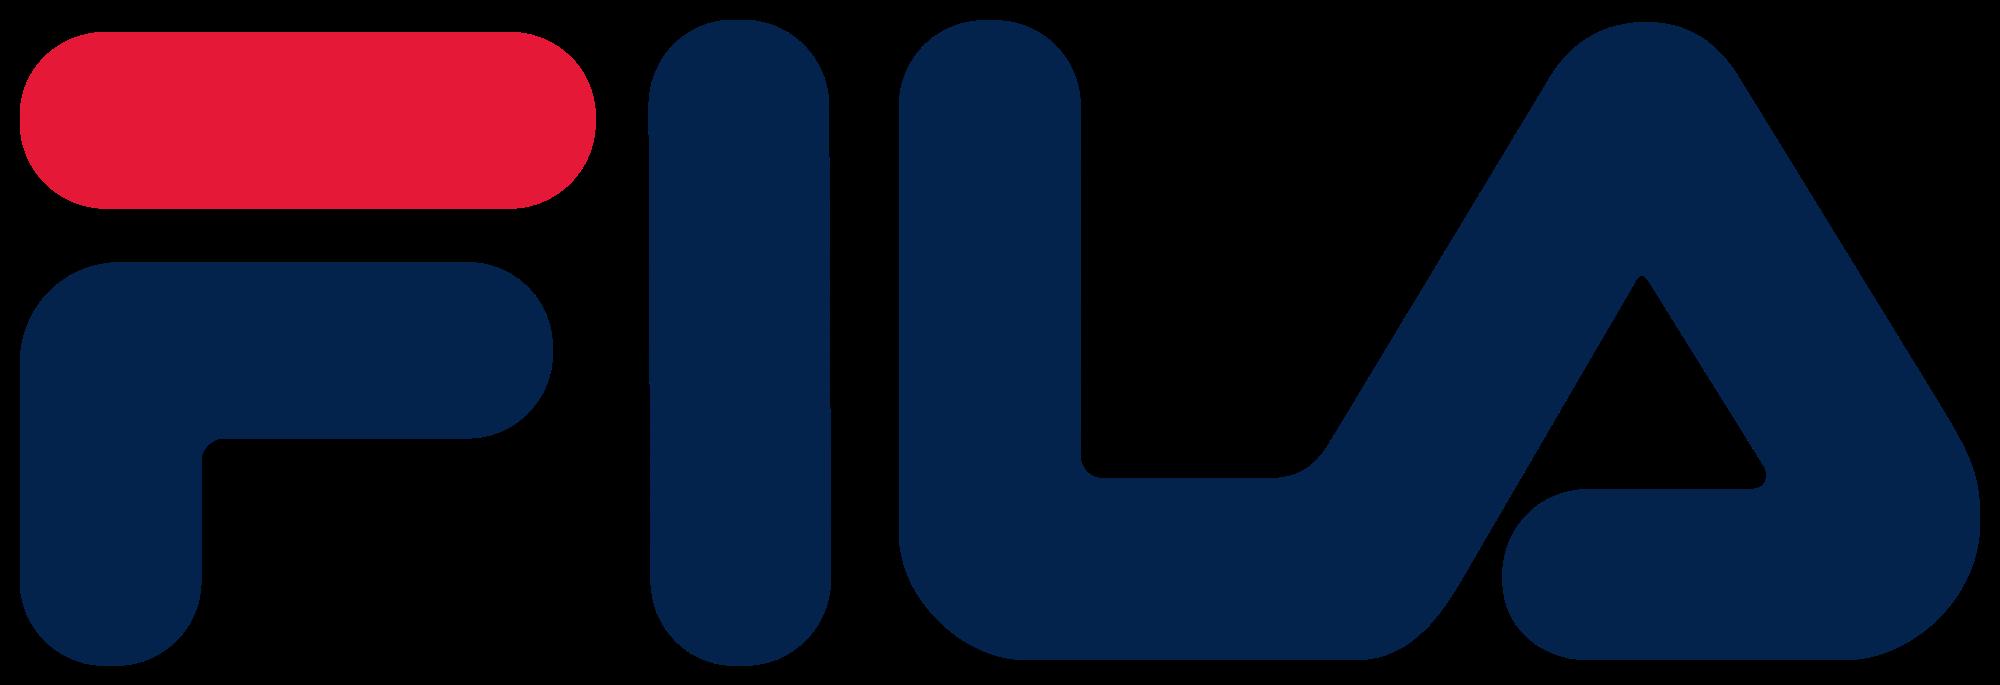 FILA Logo.png